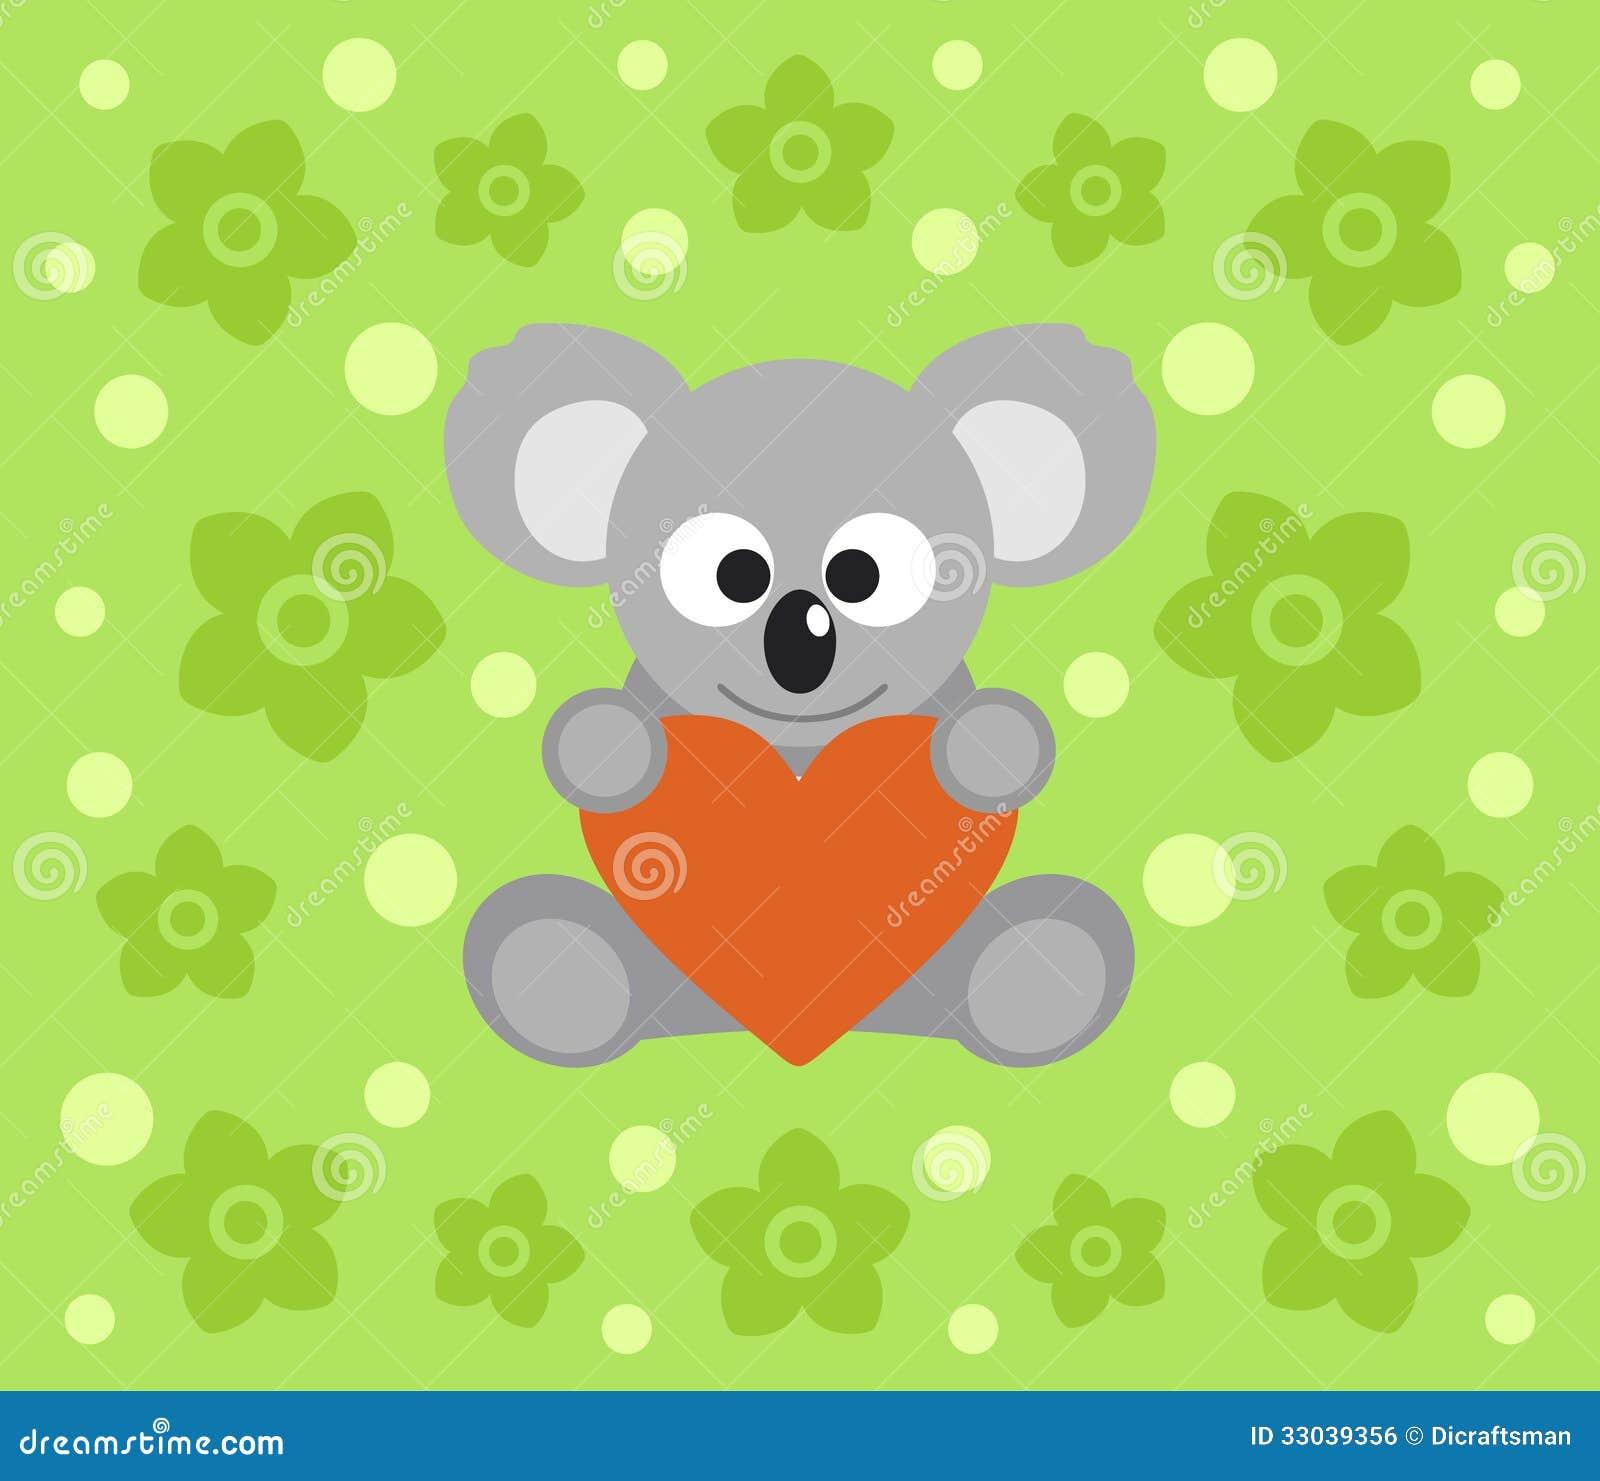 Download Wallpaper Koala Cartoon - background-koala-cartoon-funny-33039356  Picture_431142   .jpg